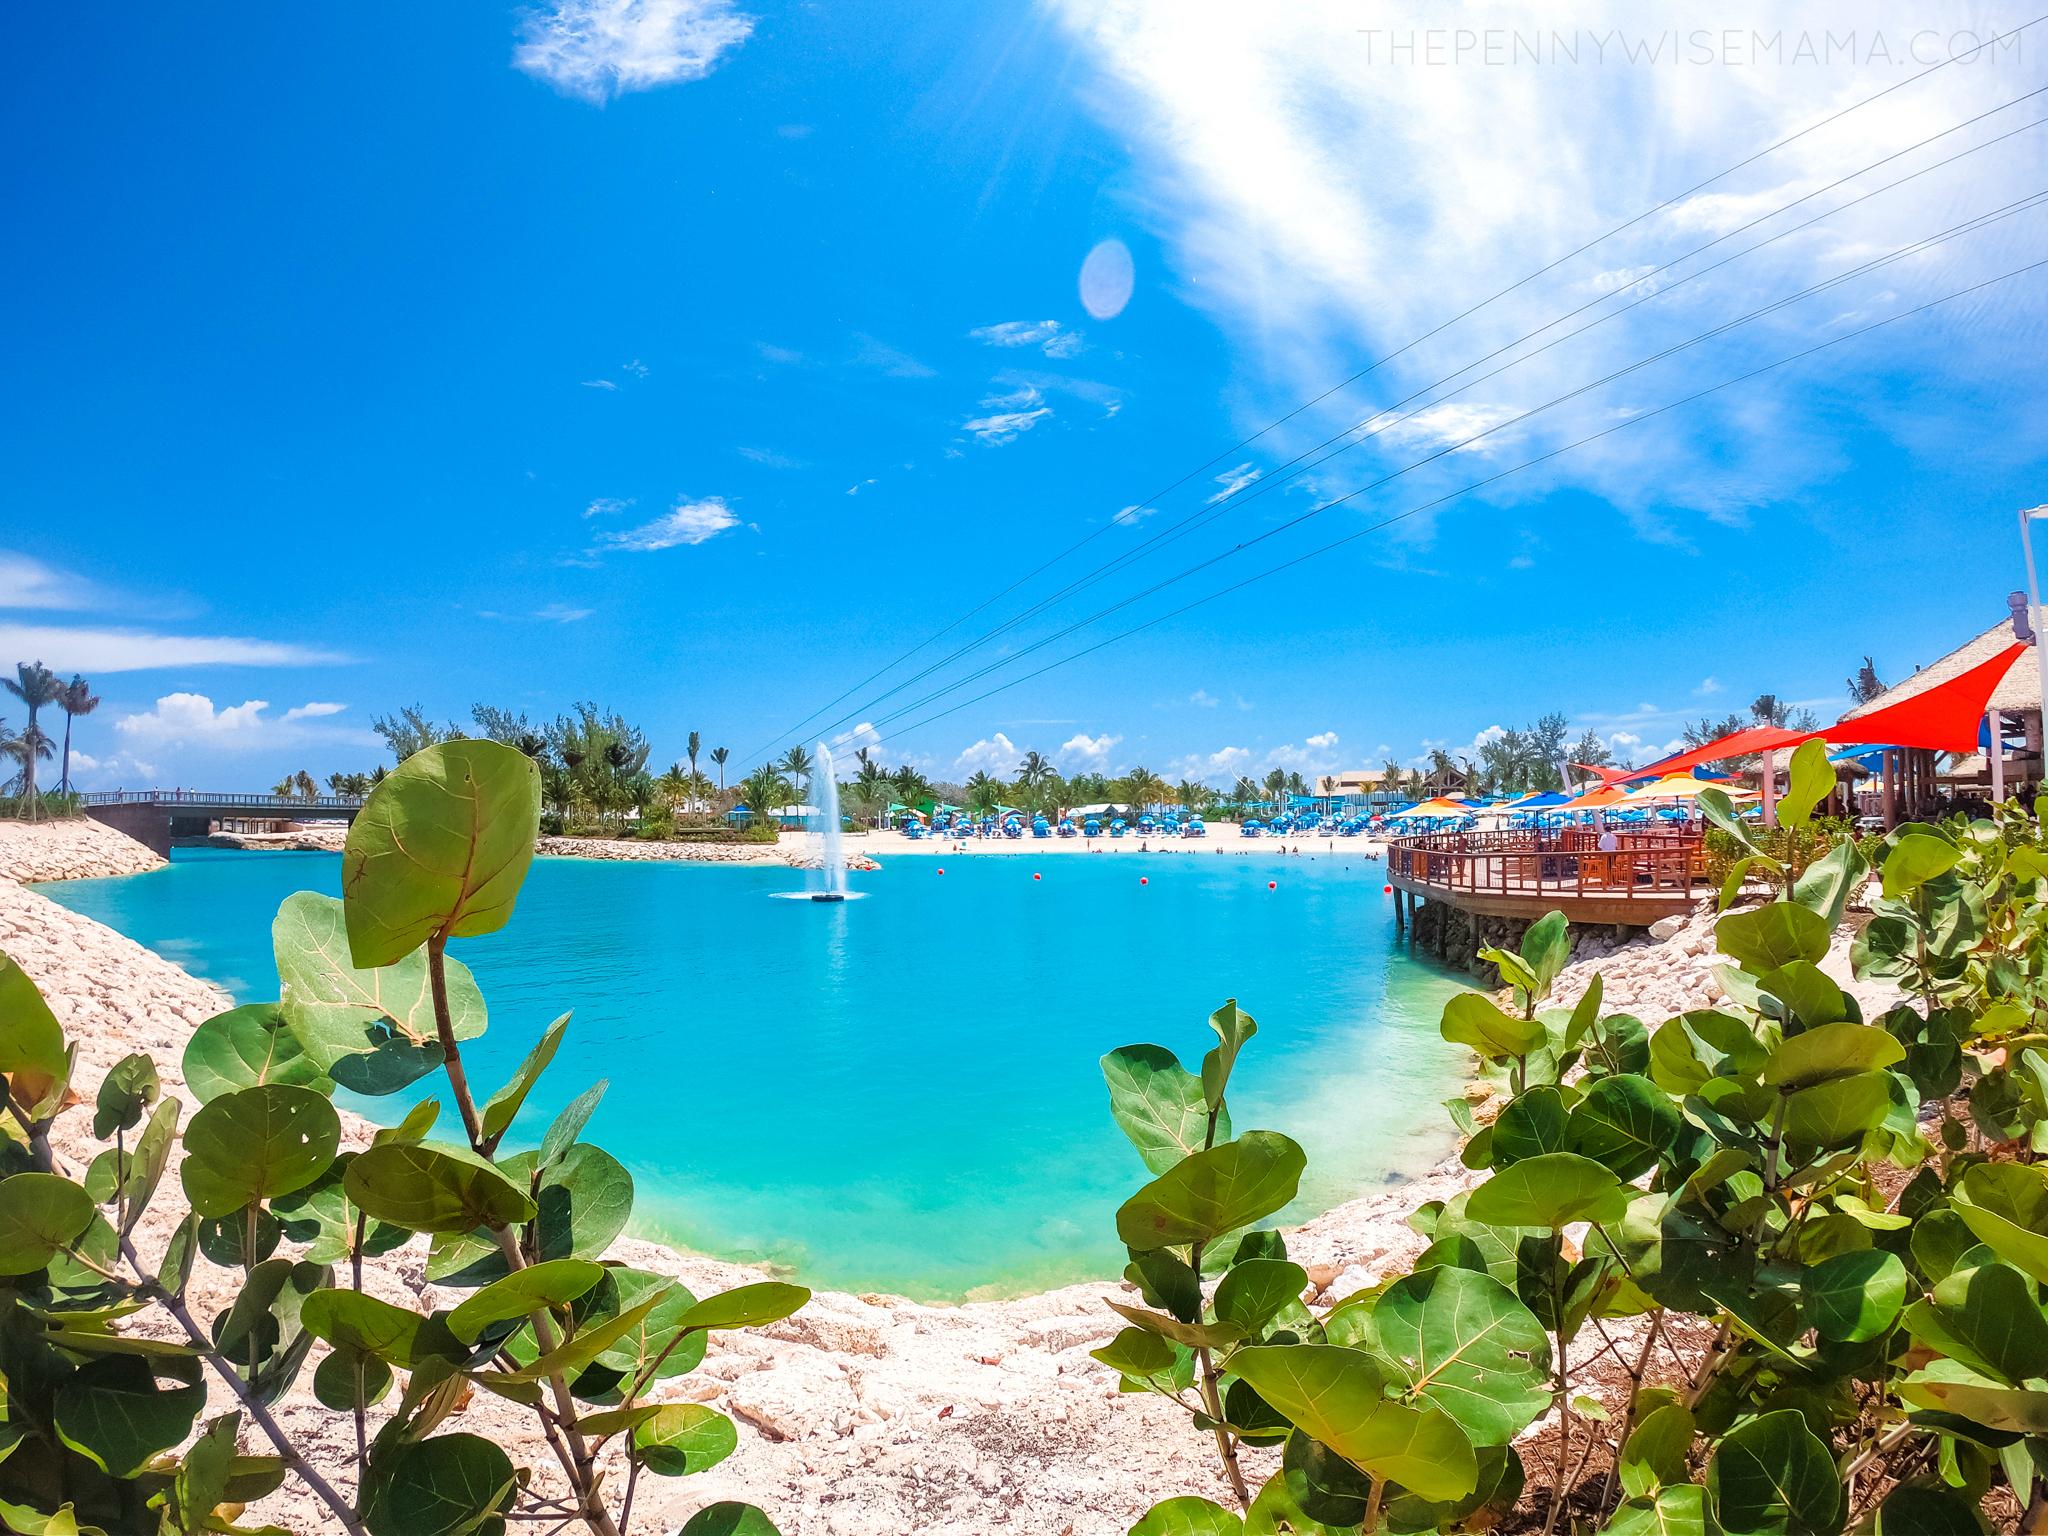 Oasis Lagoon at Perfect Day at CocoCay